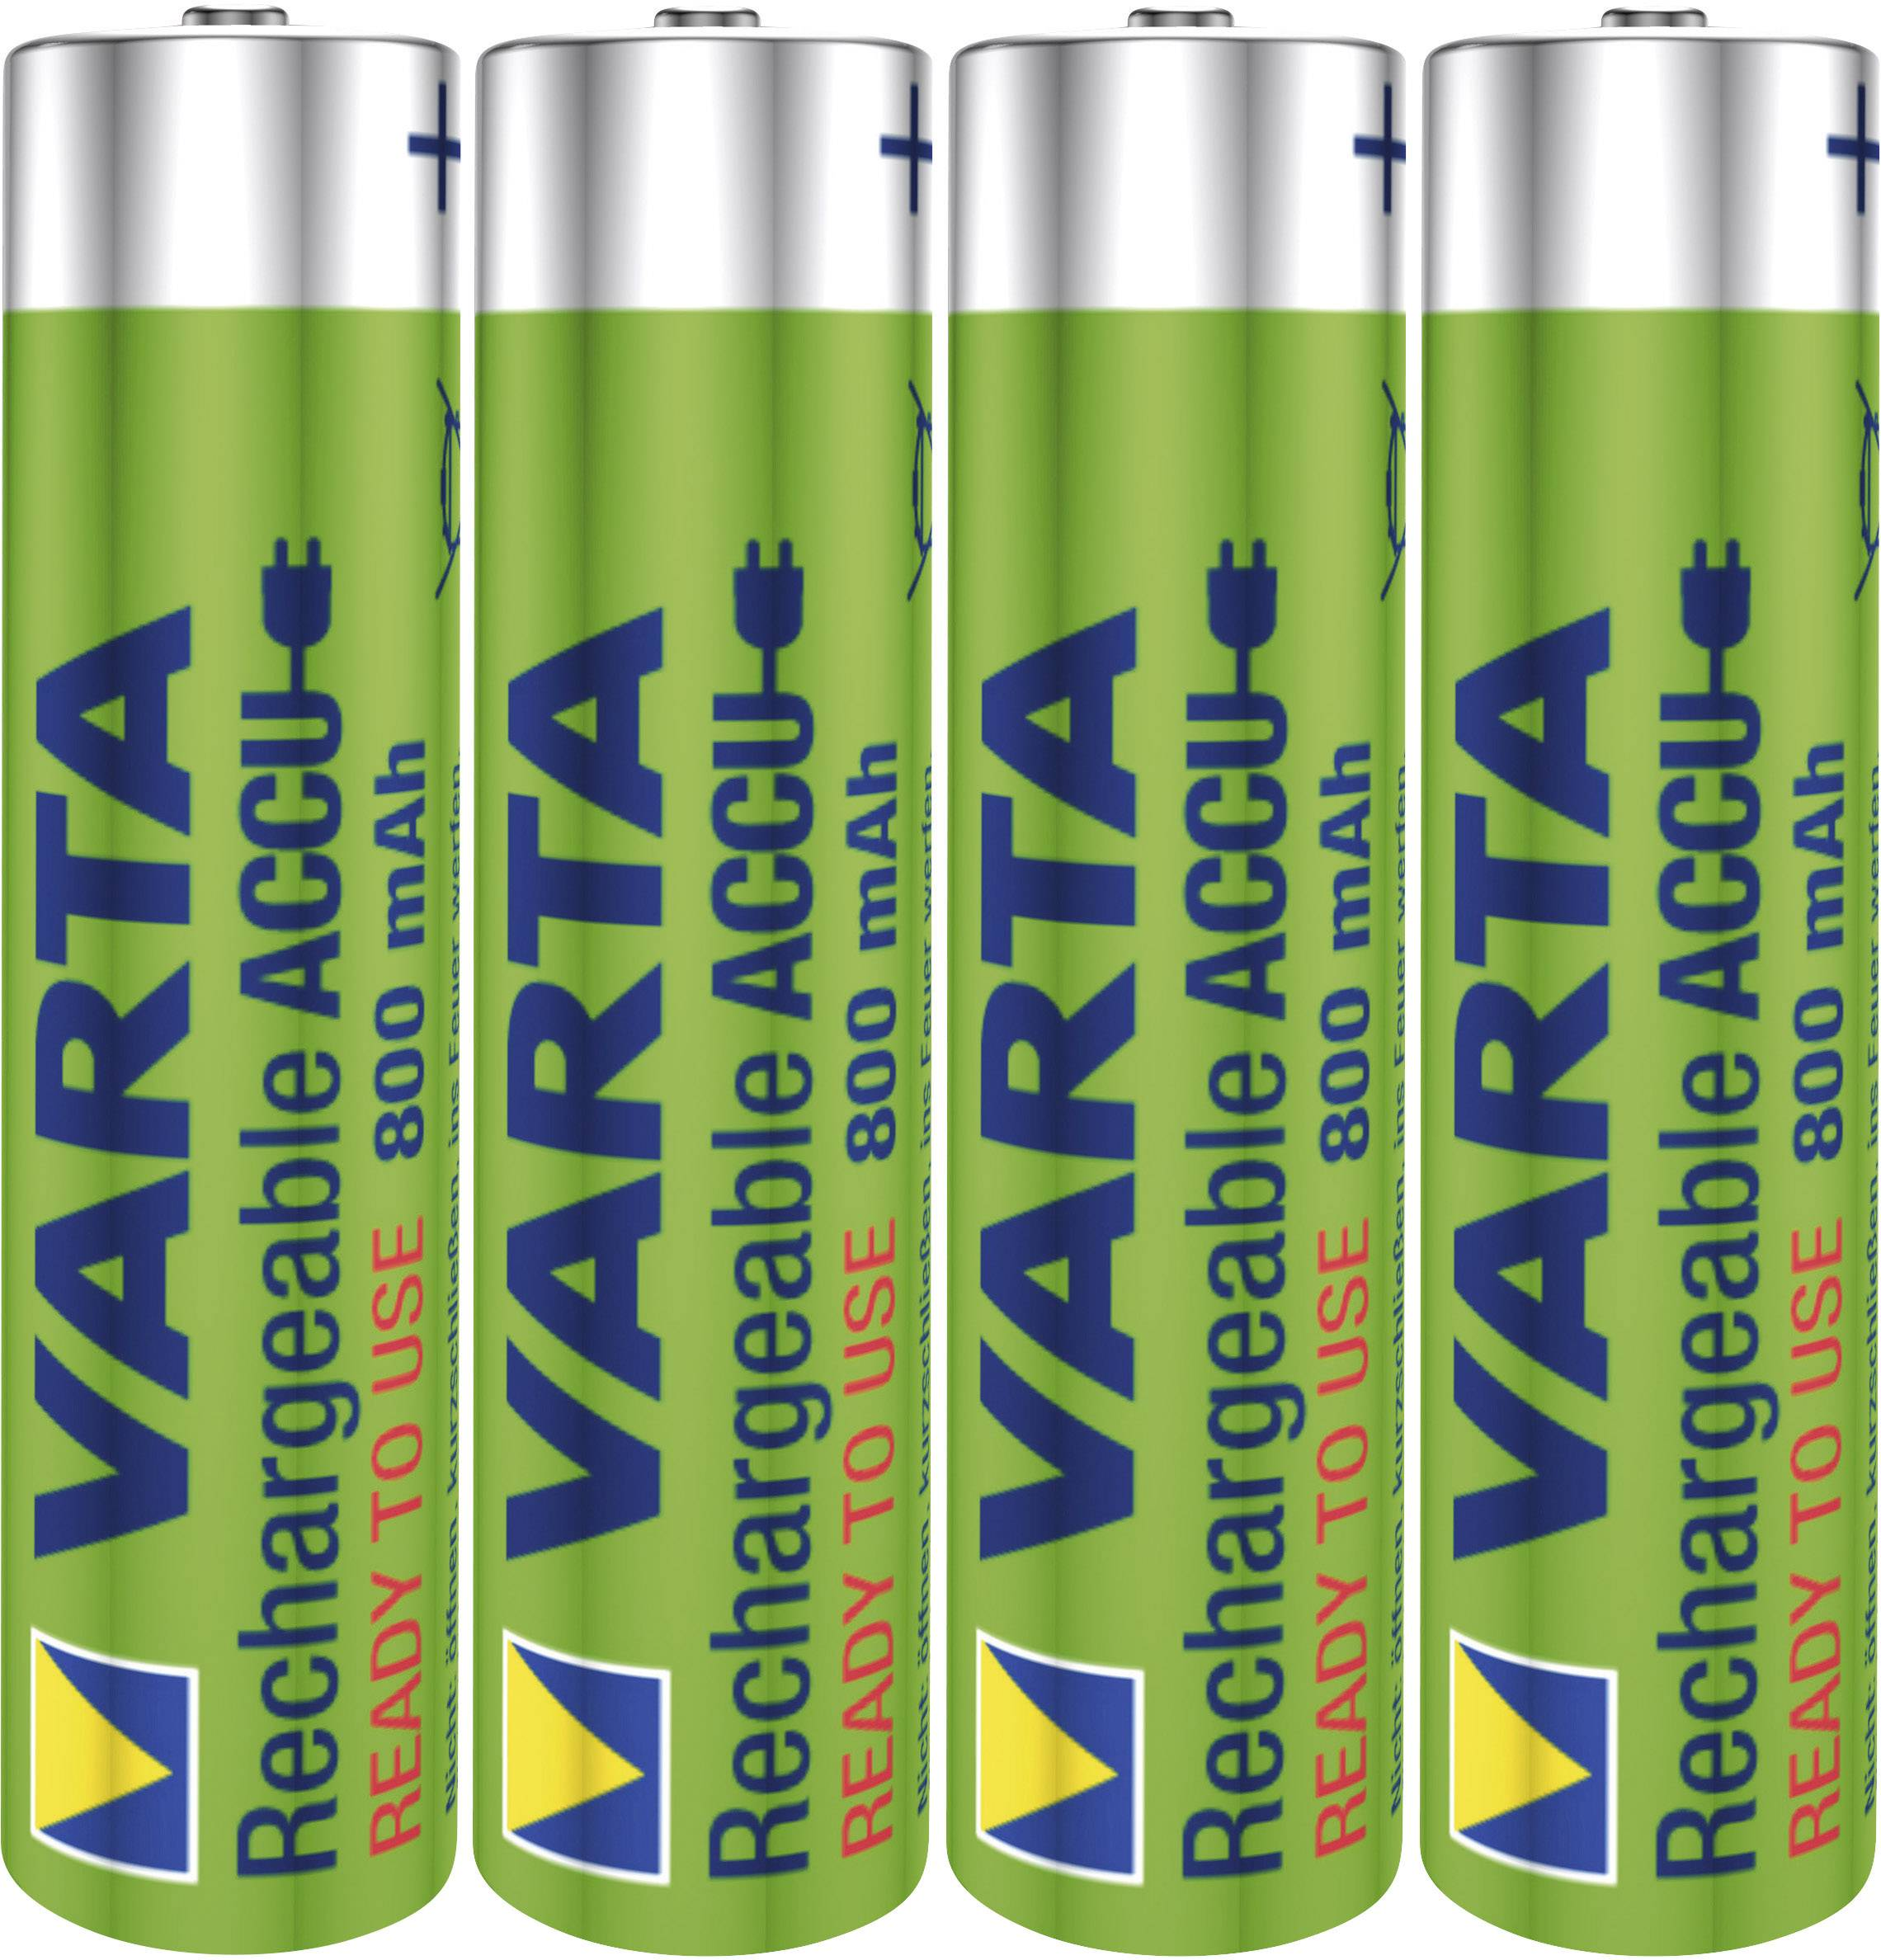 Mikrotužkový akumulátor typu AAA NiMH Varta Toy-Akku HR03 56783101404, 800 mAh, 1.2 V, 4 ks